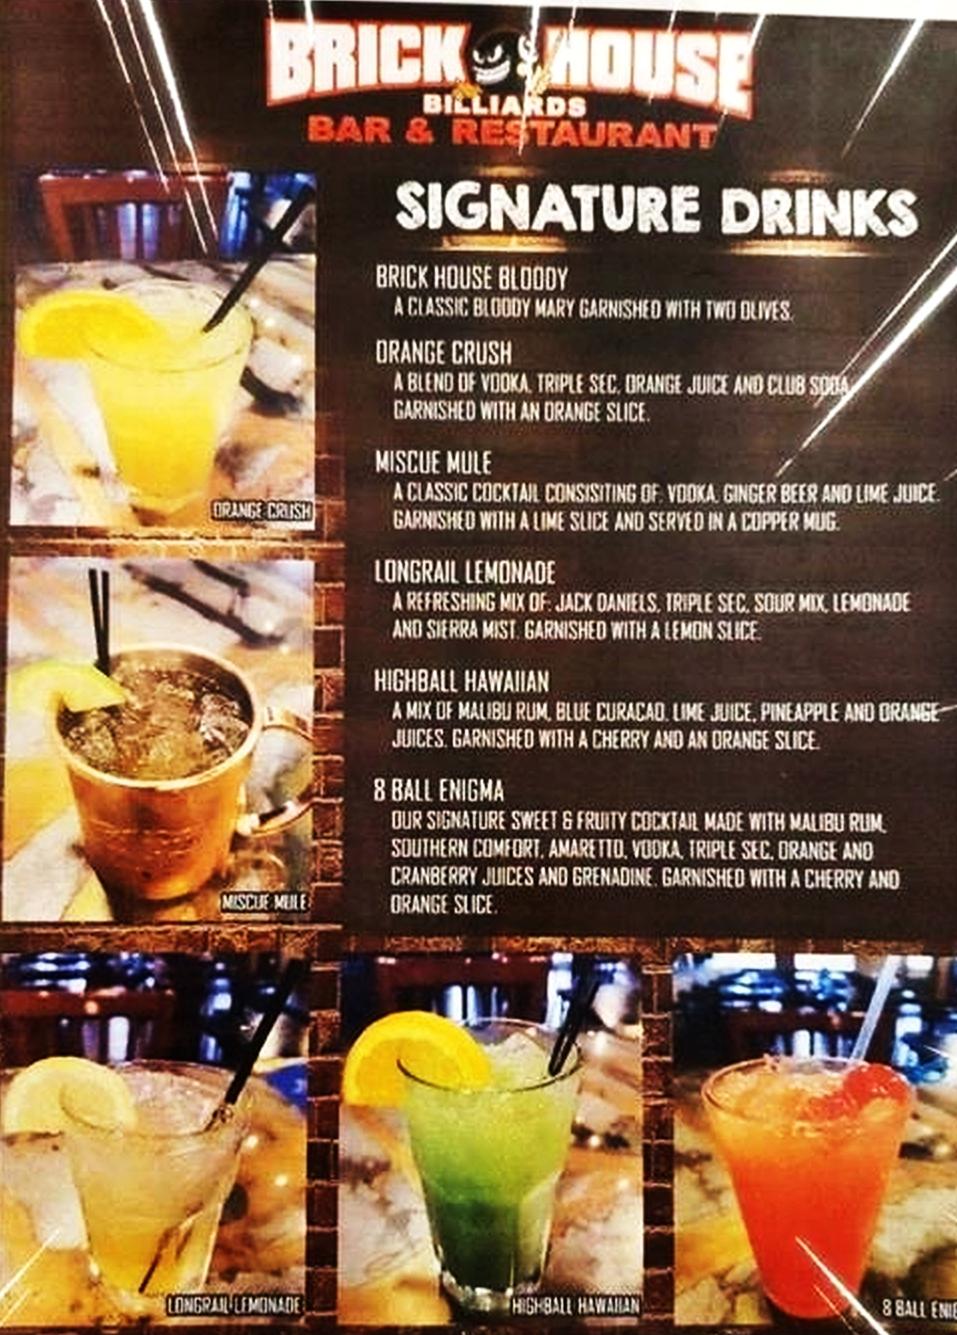 DRINKS at Brick House Billiards Bar Restaurant